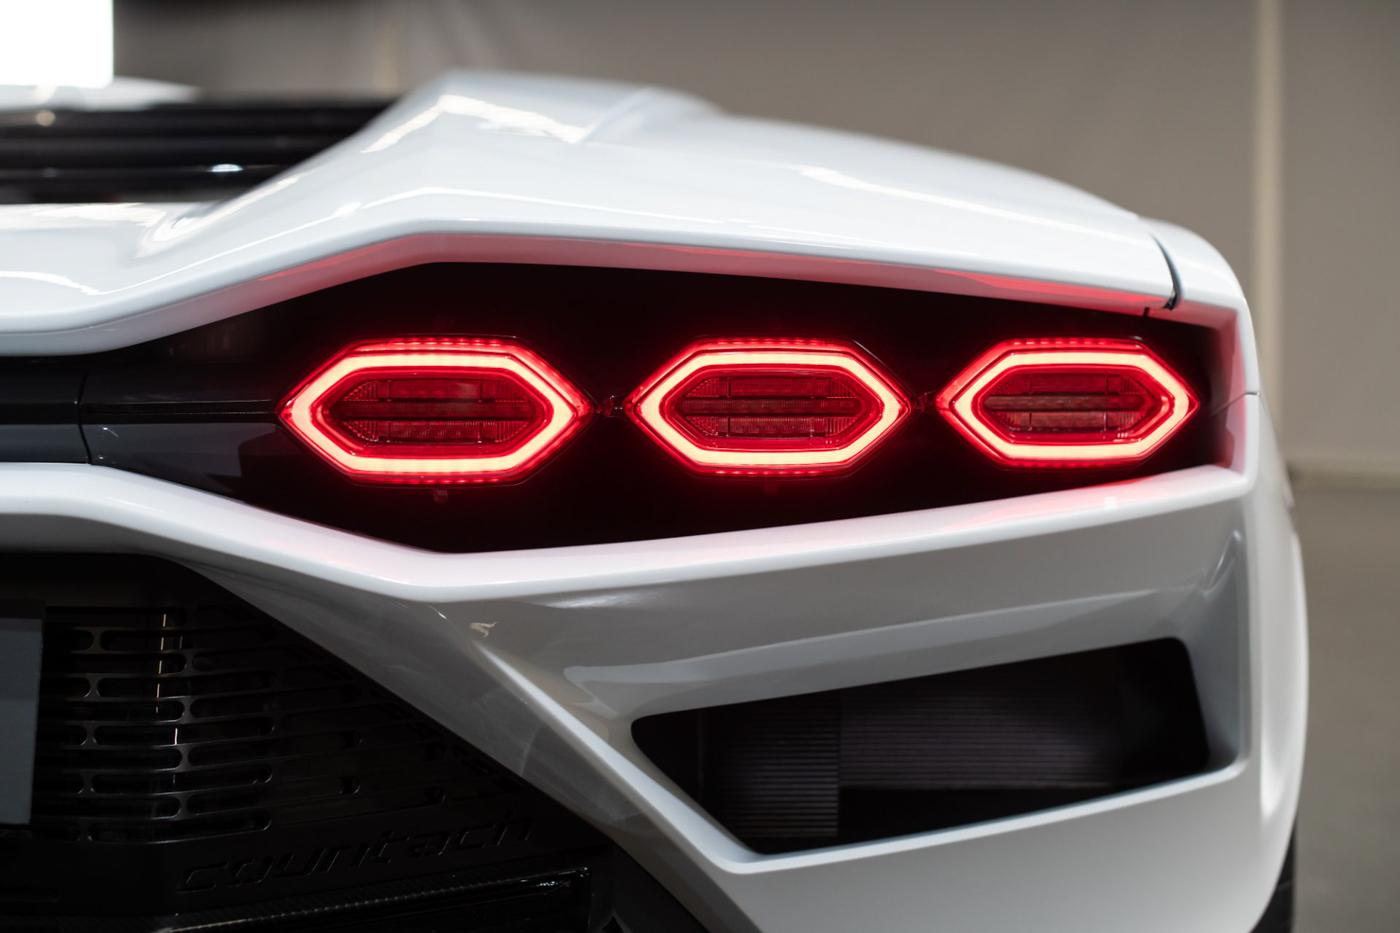 Lamborghini Countach LPI 800-4 (14).JPG